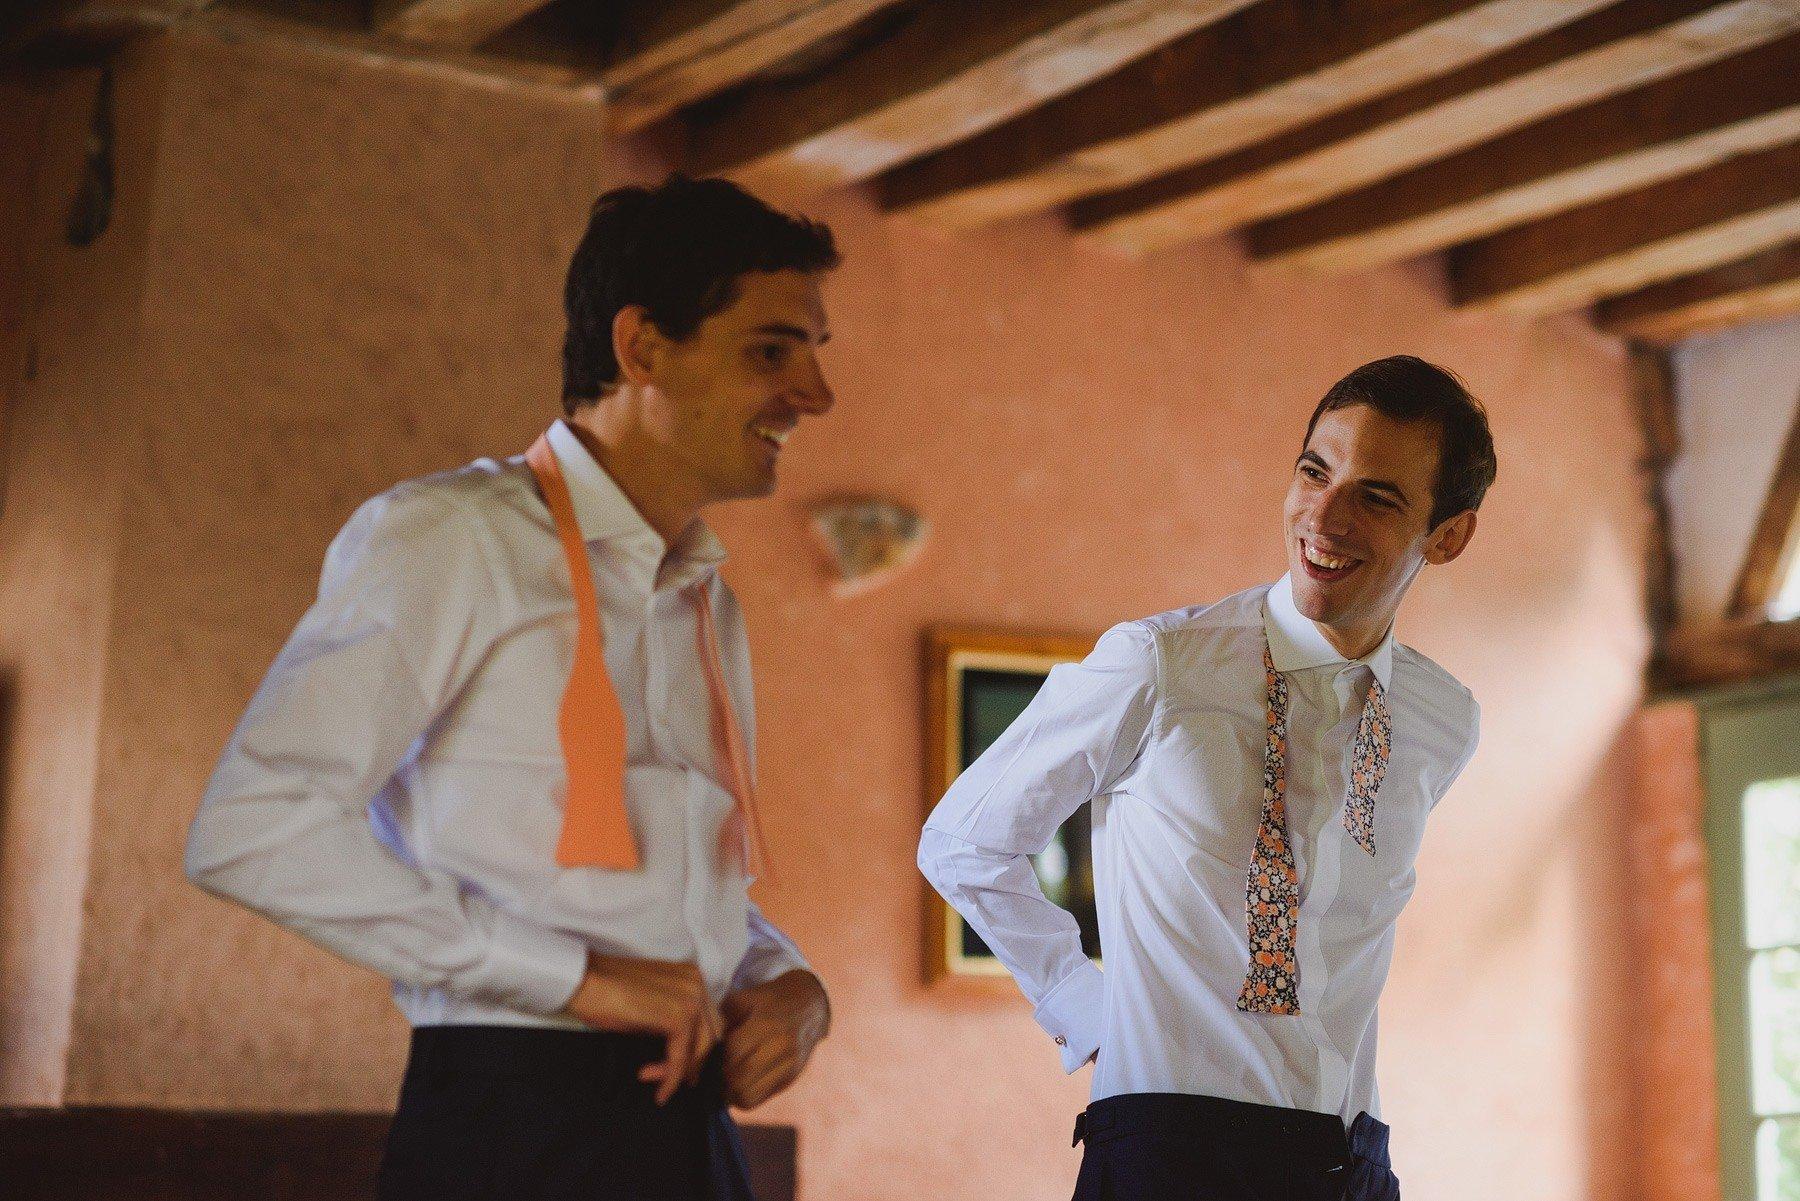 Manoir des Prévanches documentary wedding photography